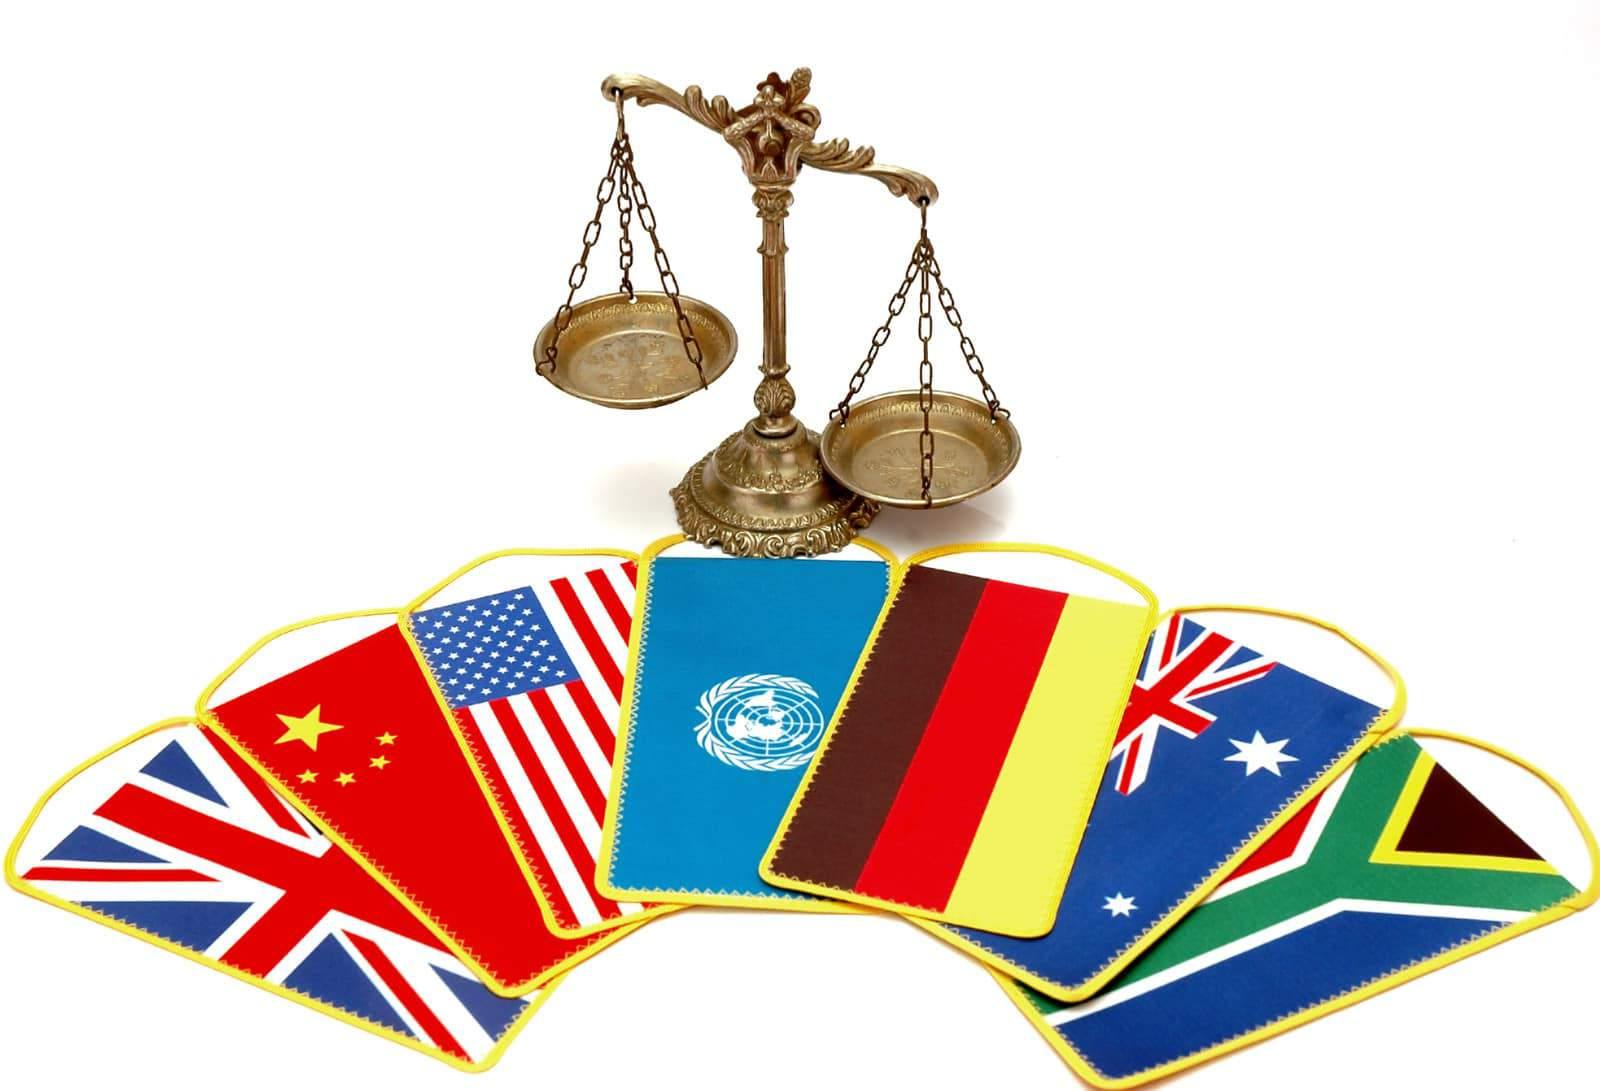 Rich-Vaughn-Blog-International-Law